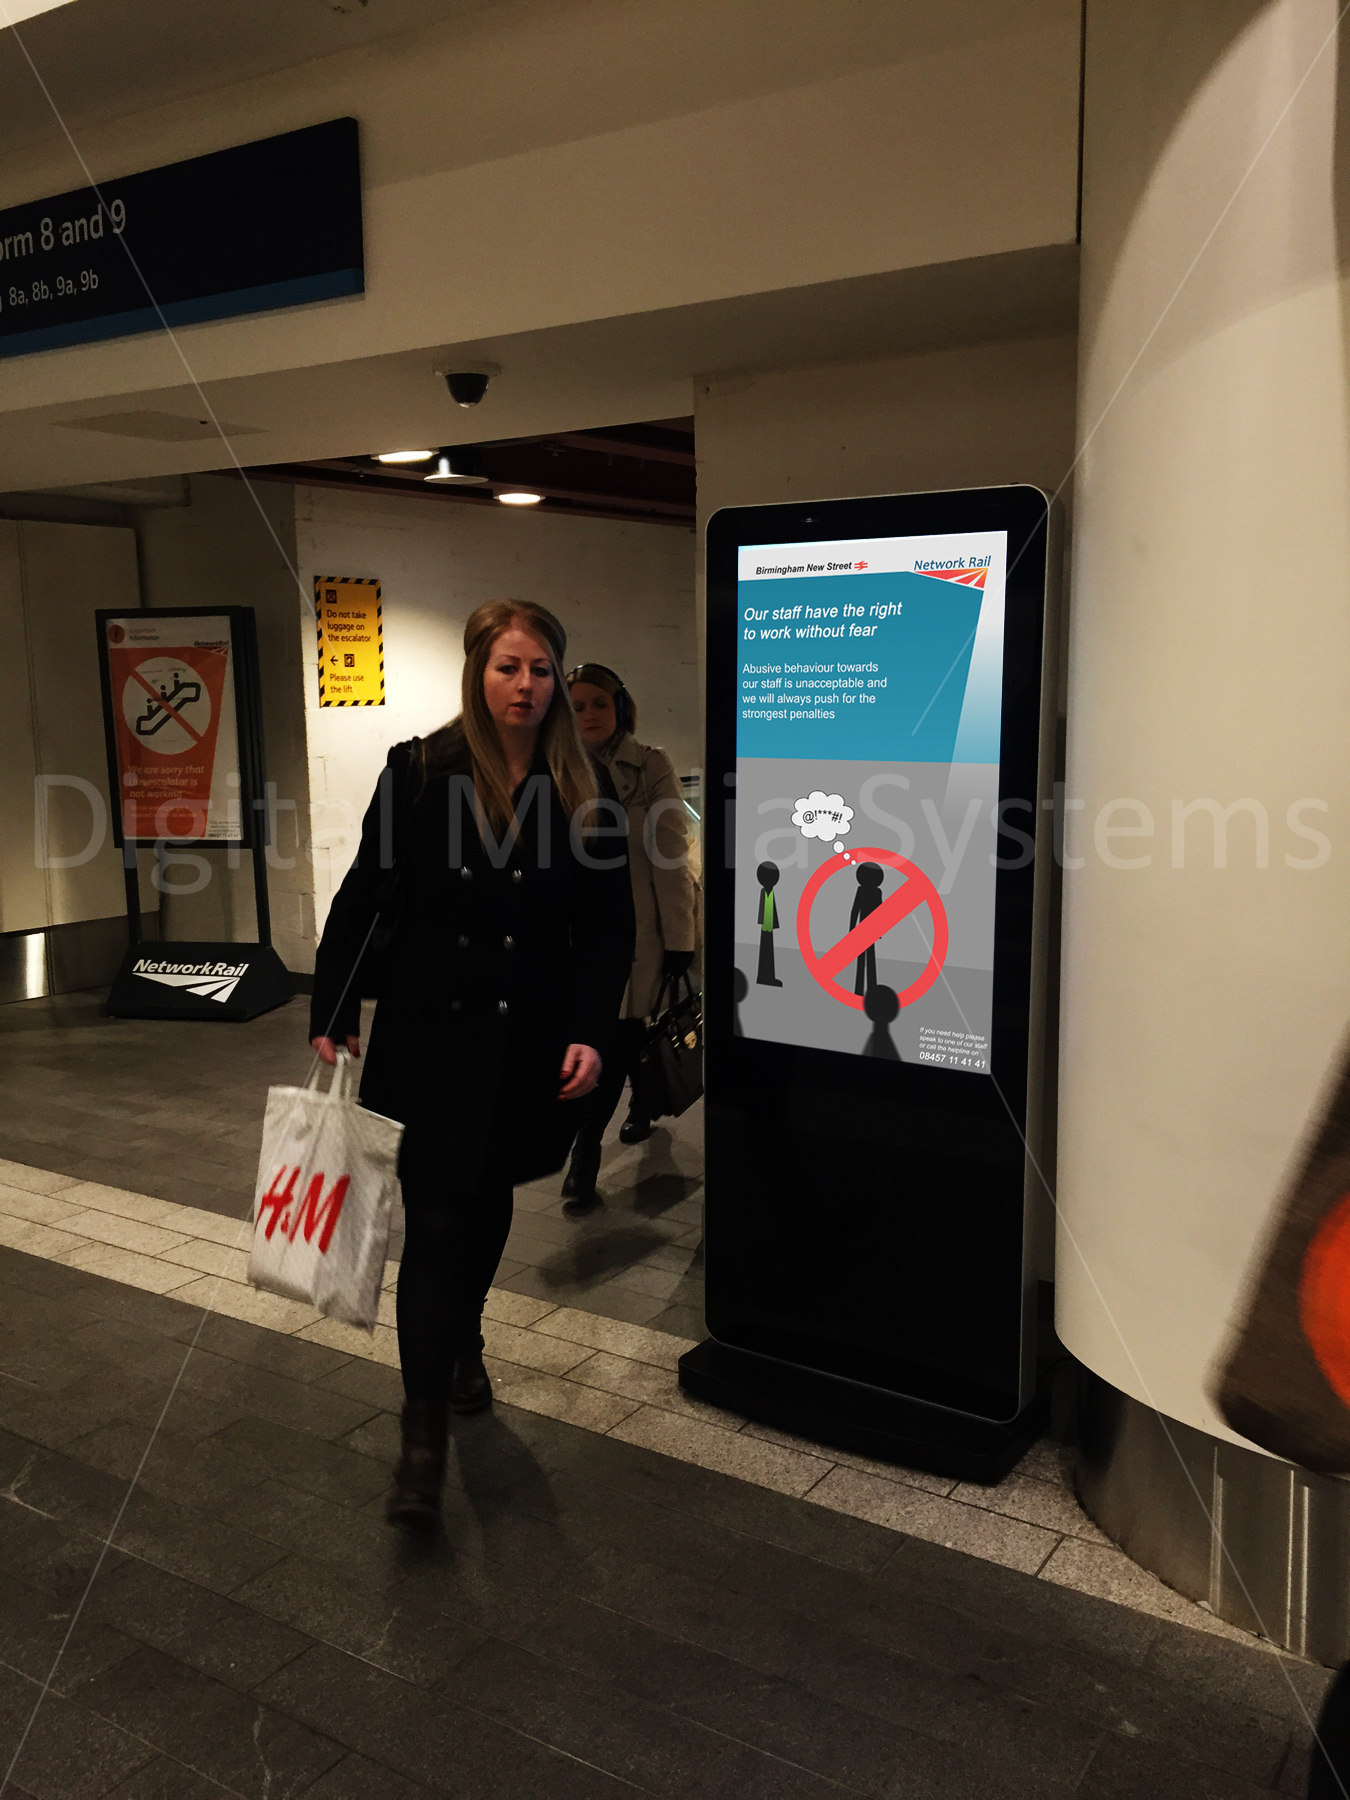 Digital Signage at Network Rail